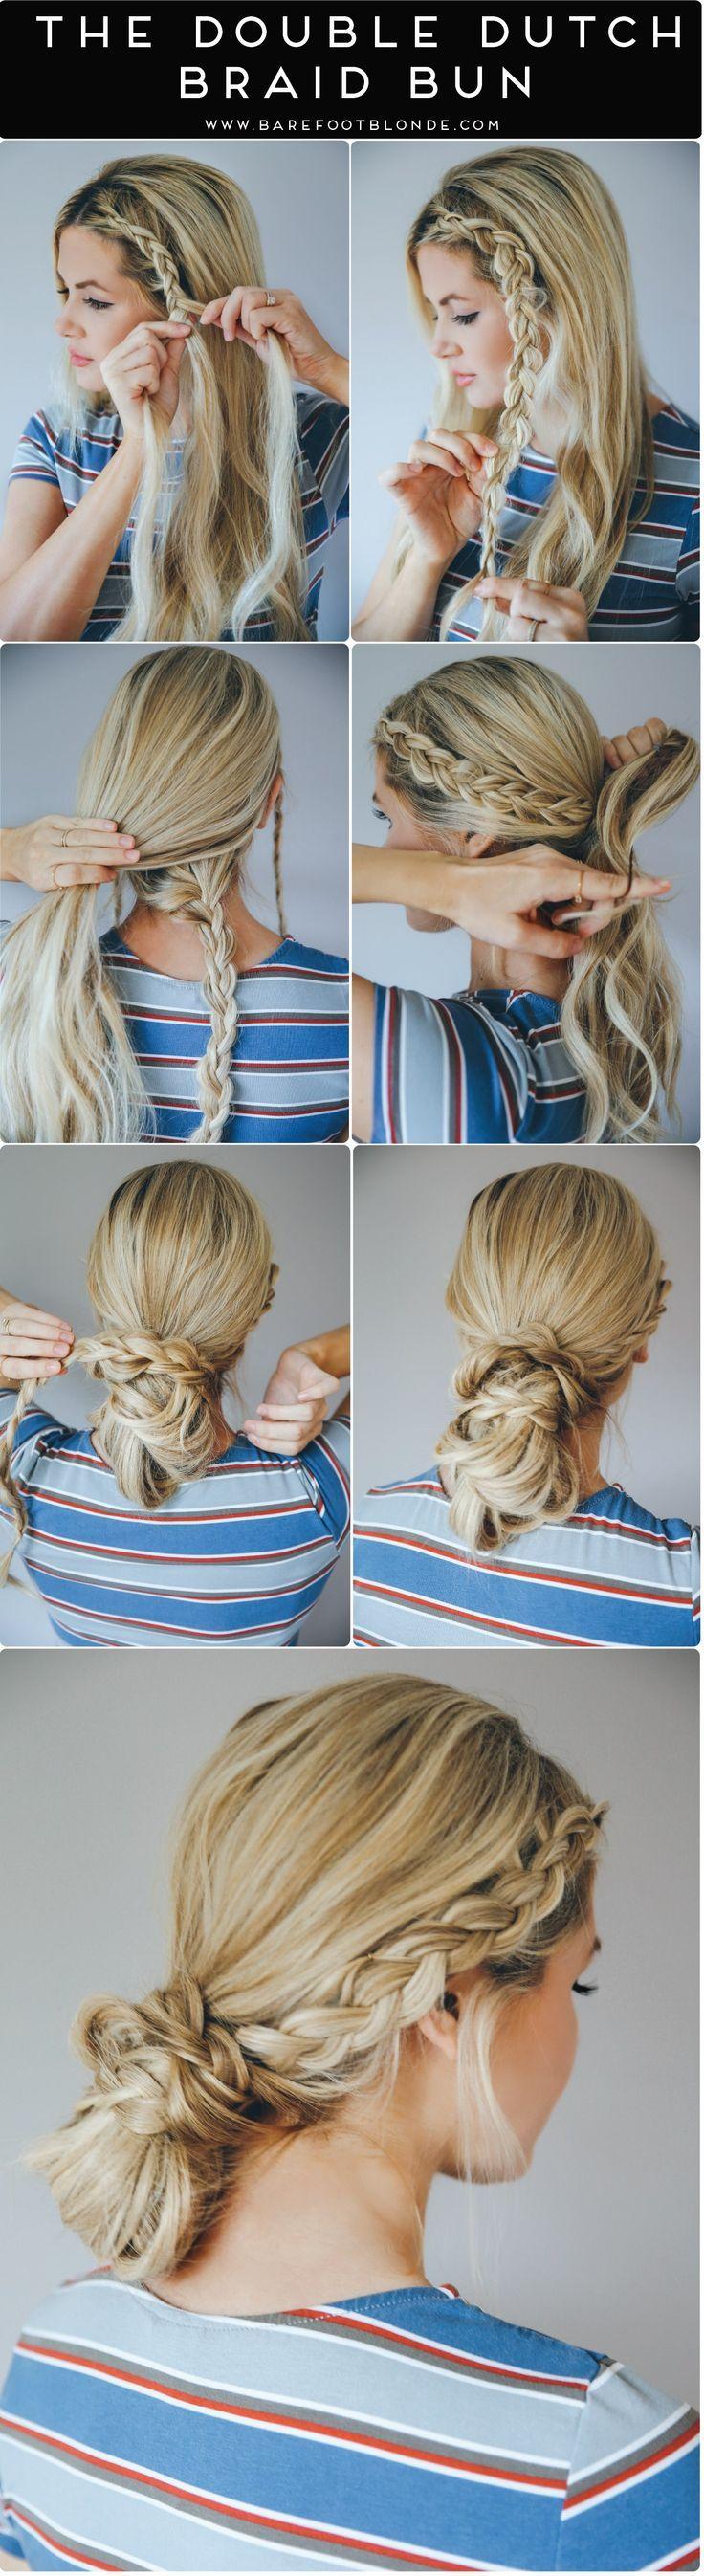 best 25+ beach hairstyles ideas on pinterest | hair styles beach